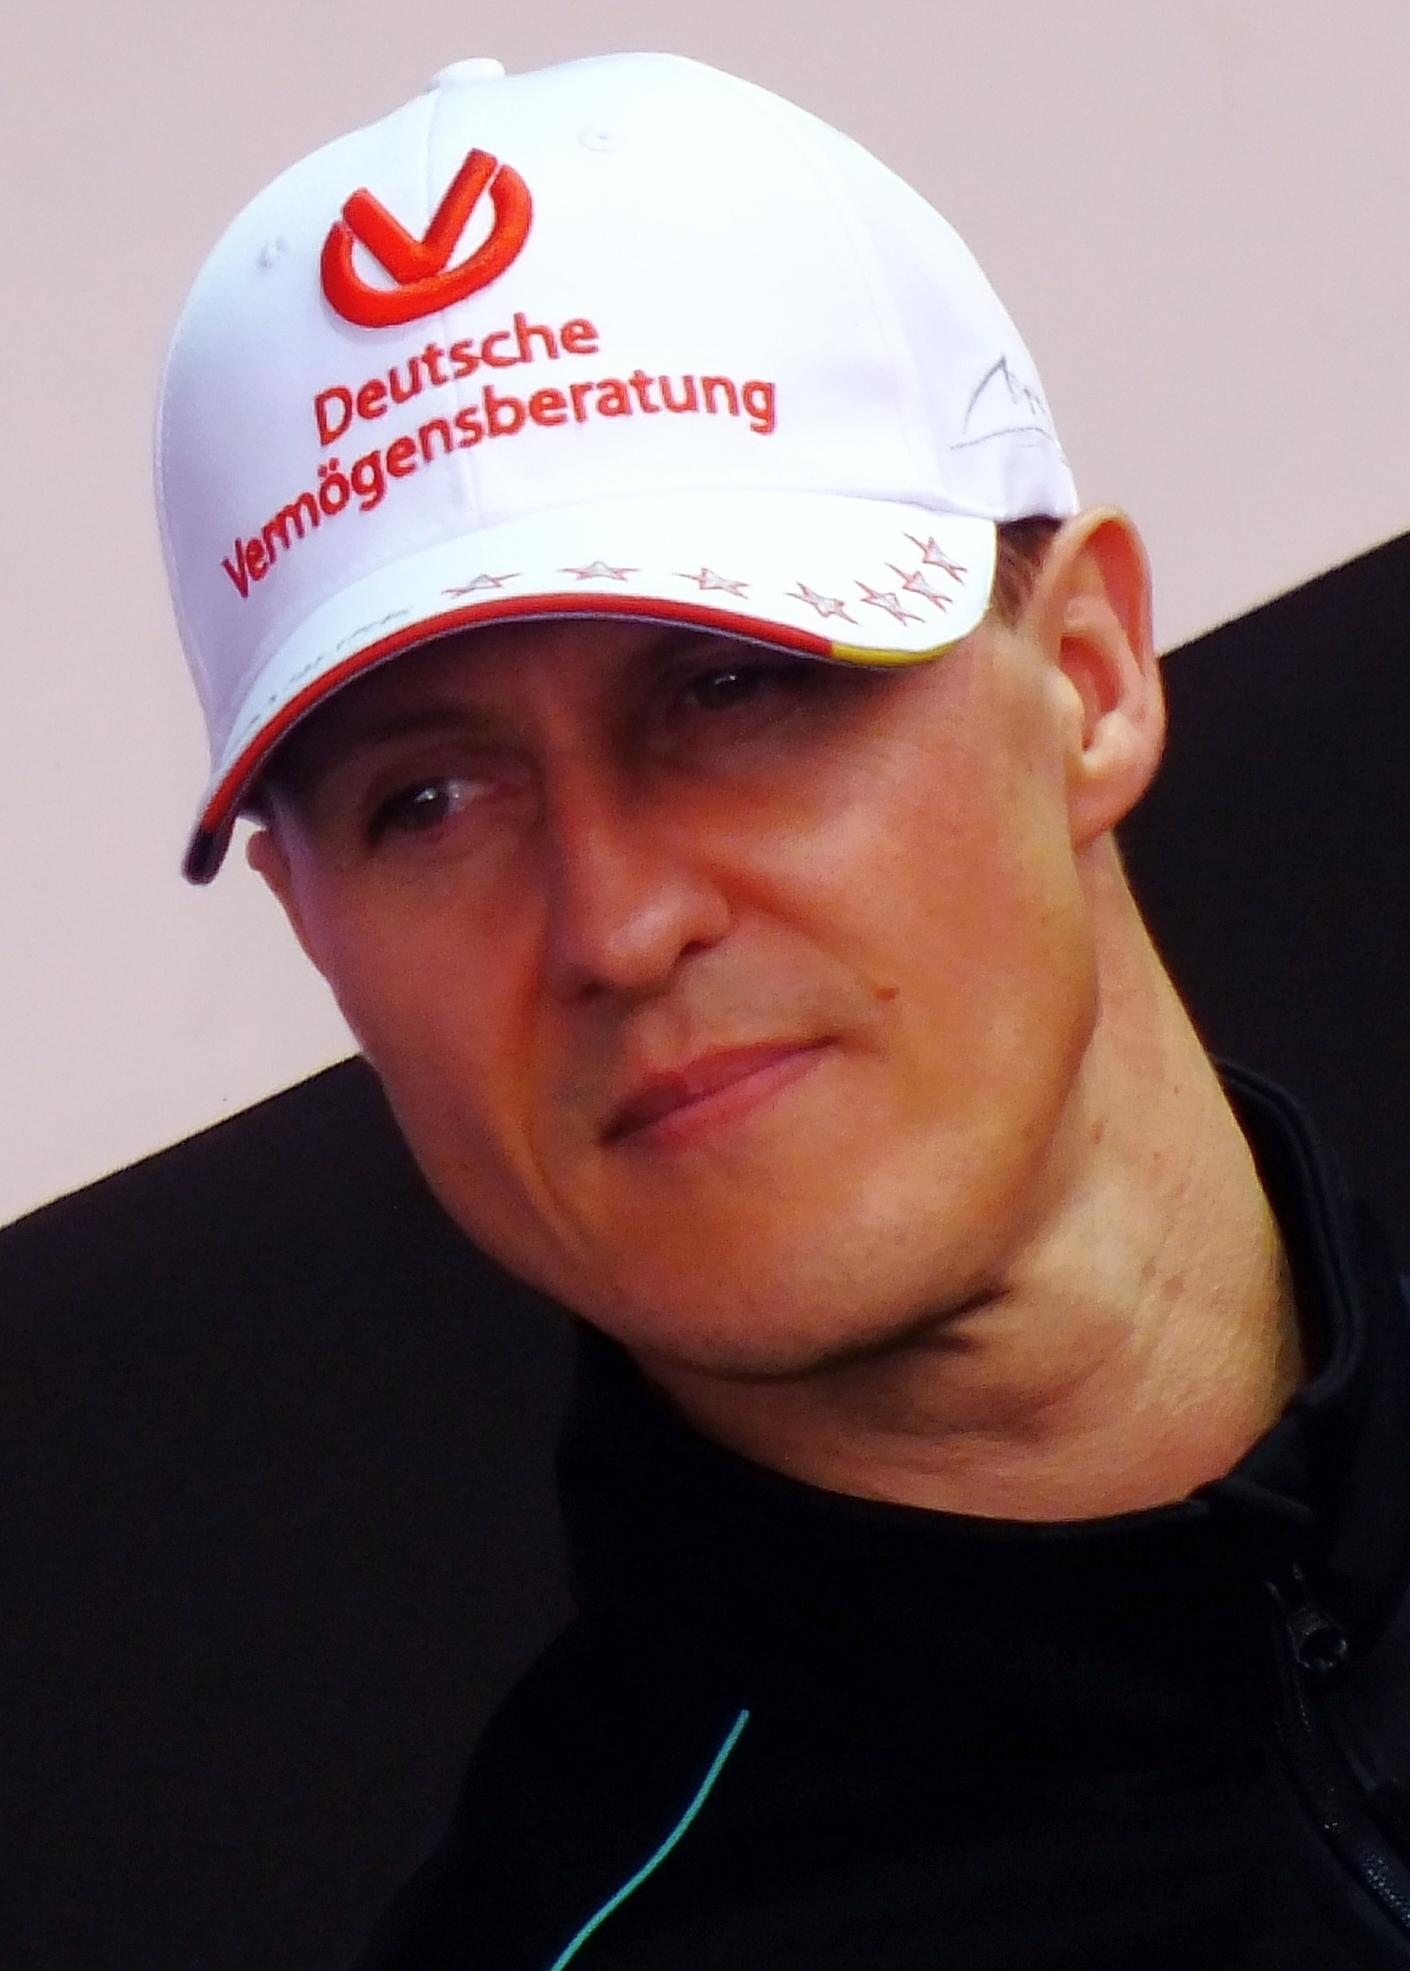 25-år gammel 174 cm høy Michael Schumacher i 2021